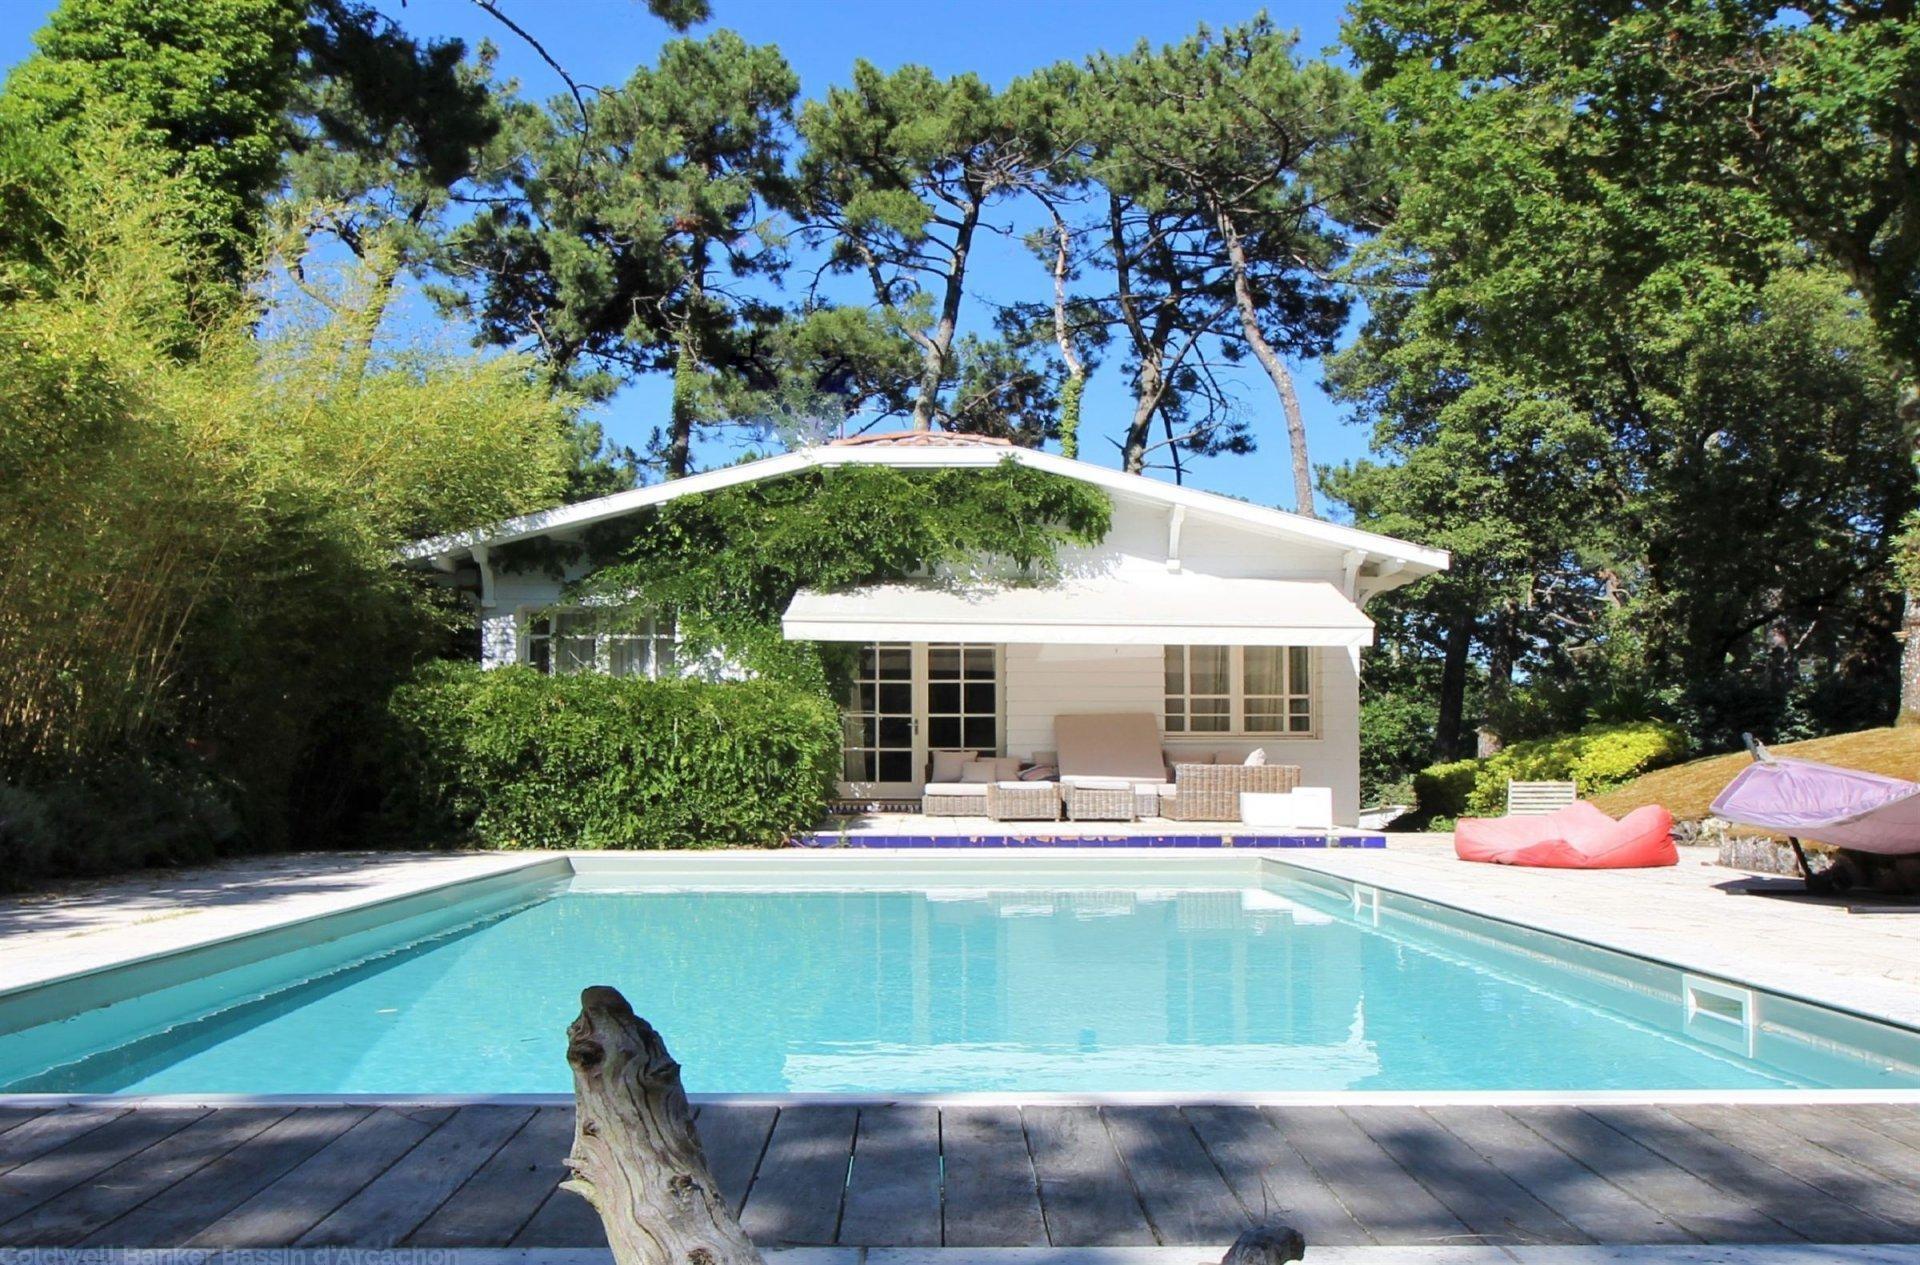 Vente propri t avec villa piscine et grand terrain - Camping dune du pyla avec piscine ...